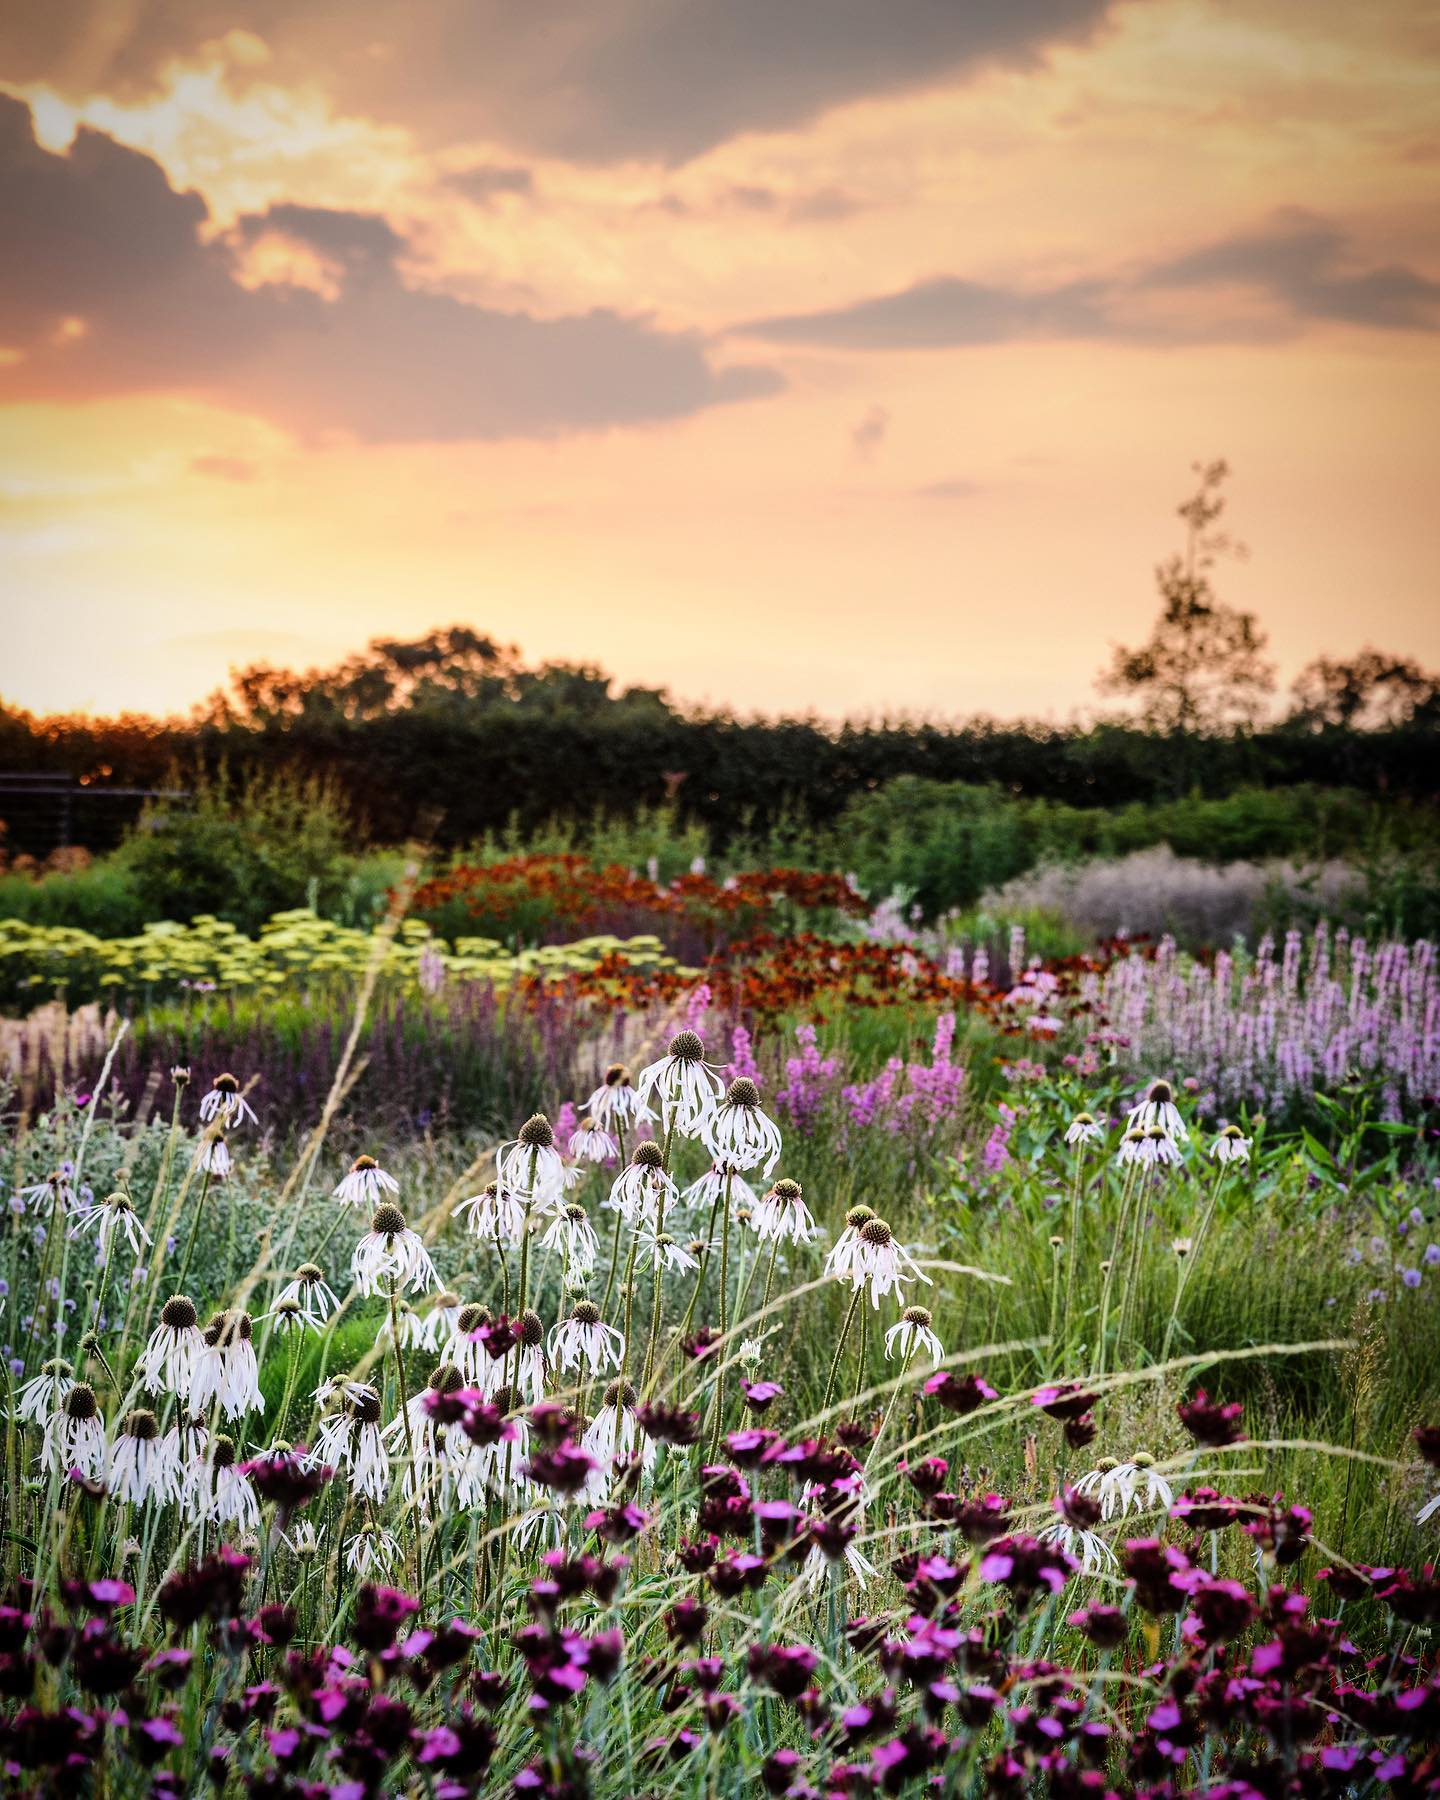 Sunrise in the Oudolf Field @hauserwirthsomerset @pietoudolf ...#pietoudolf #hauserandwirth #hauserwirthsomerset #dursladefarm #oudolffield #plantingtheoudolfgardens #gardenphotography #gardenphotographer #somerset #somersetgarden